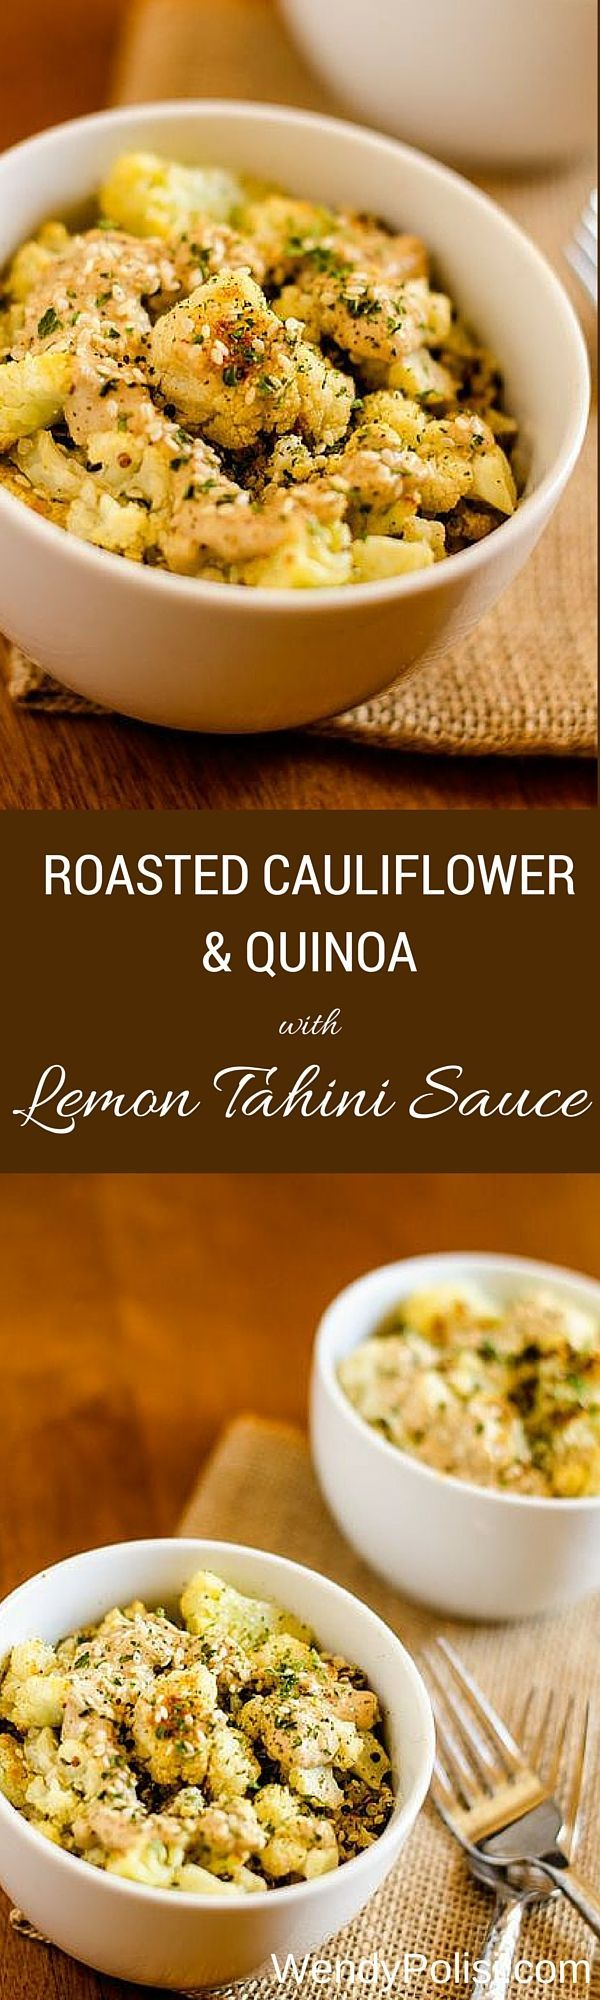 Roasted Cauliflower Quinoa With Lemon Tahini Sauce